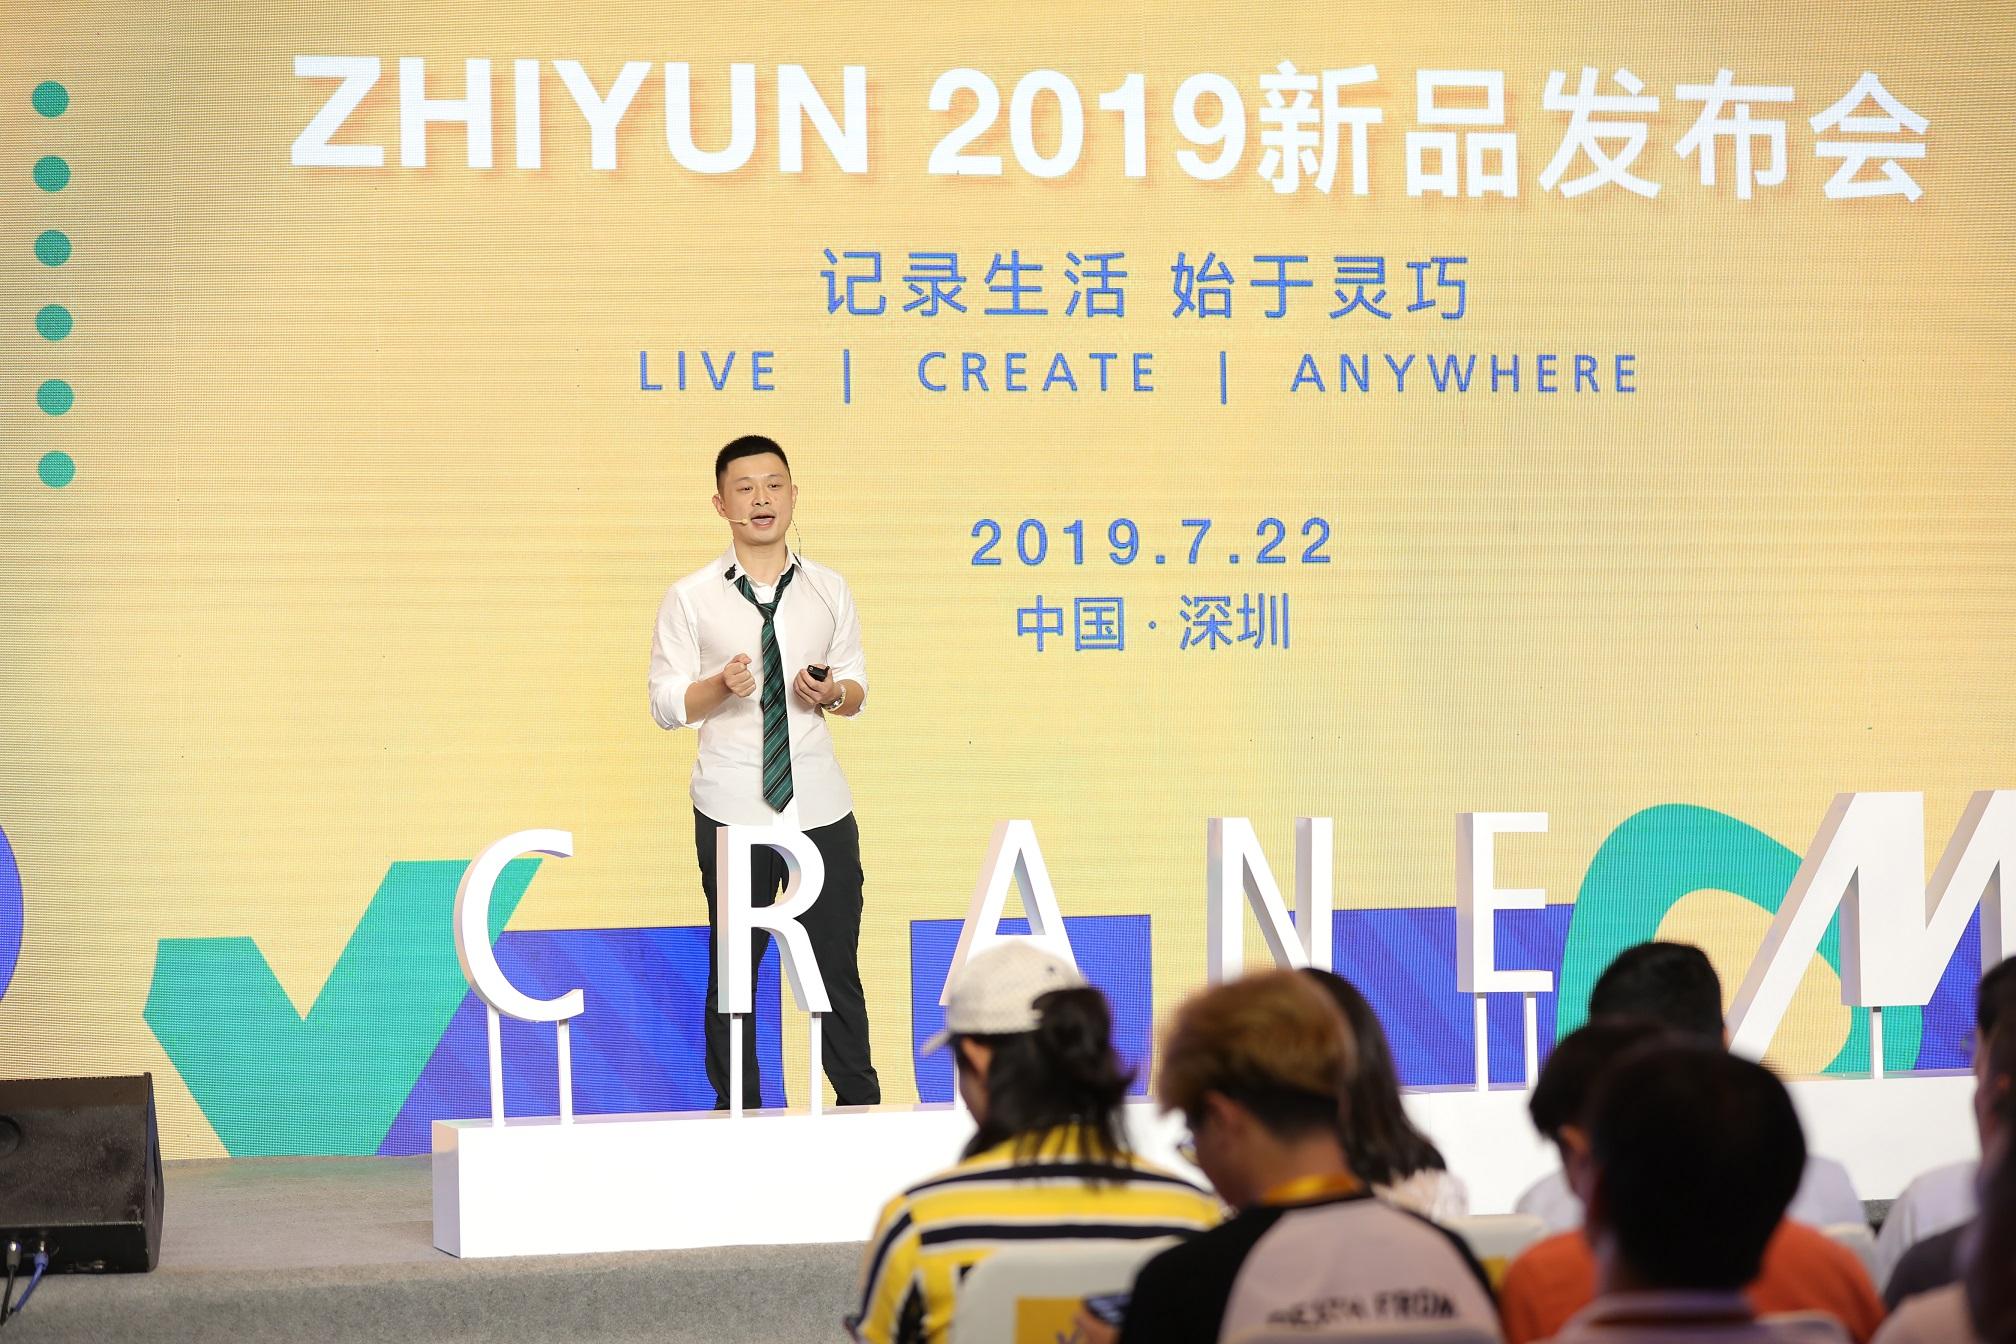 ZHIYUN重磅发布三轴稳定器云鹤M2 仅售1499元